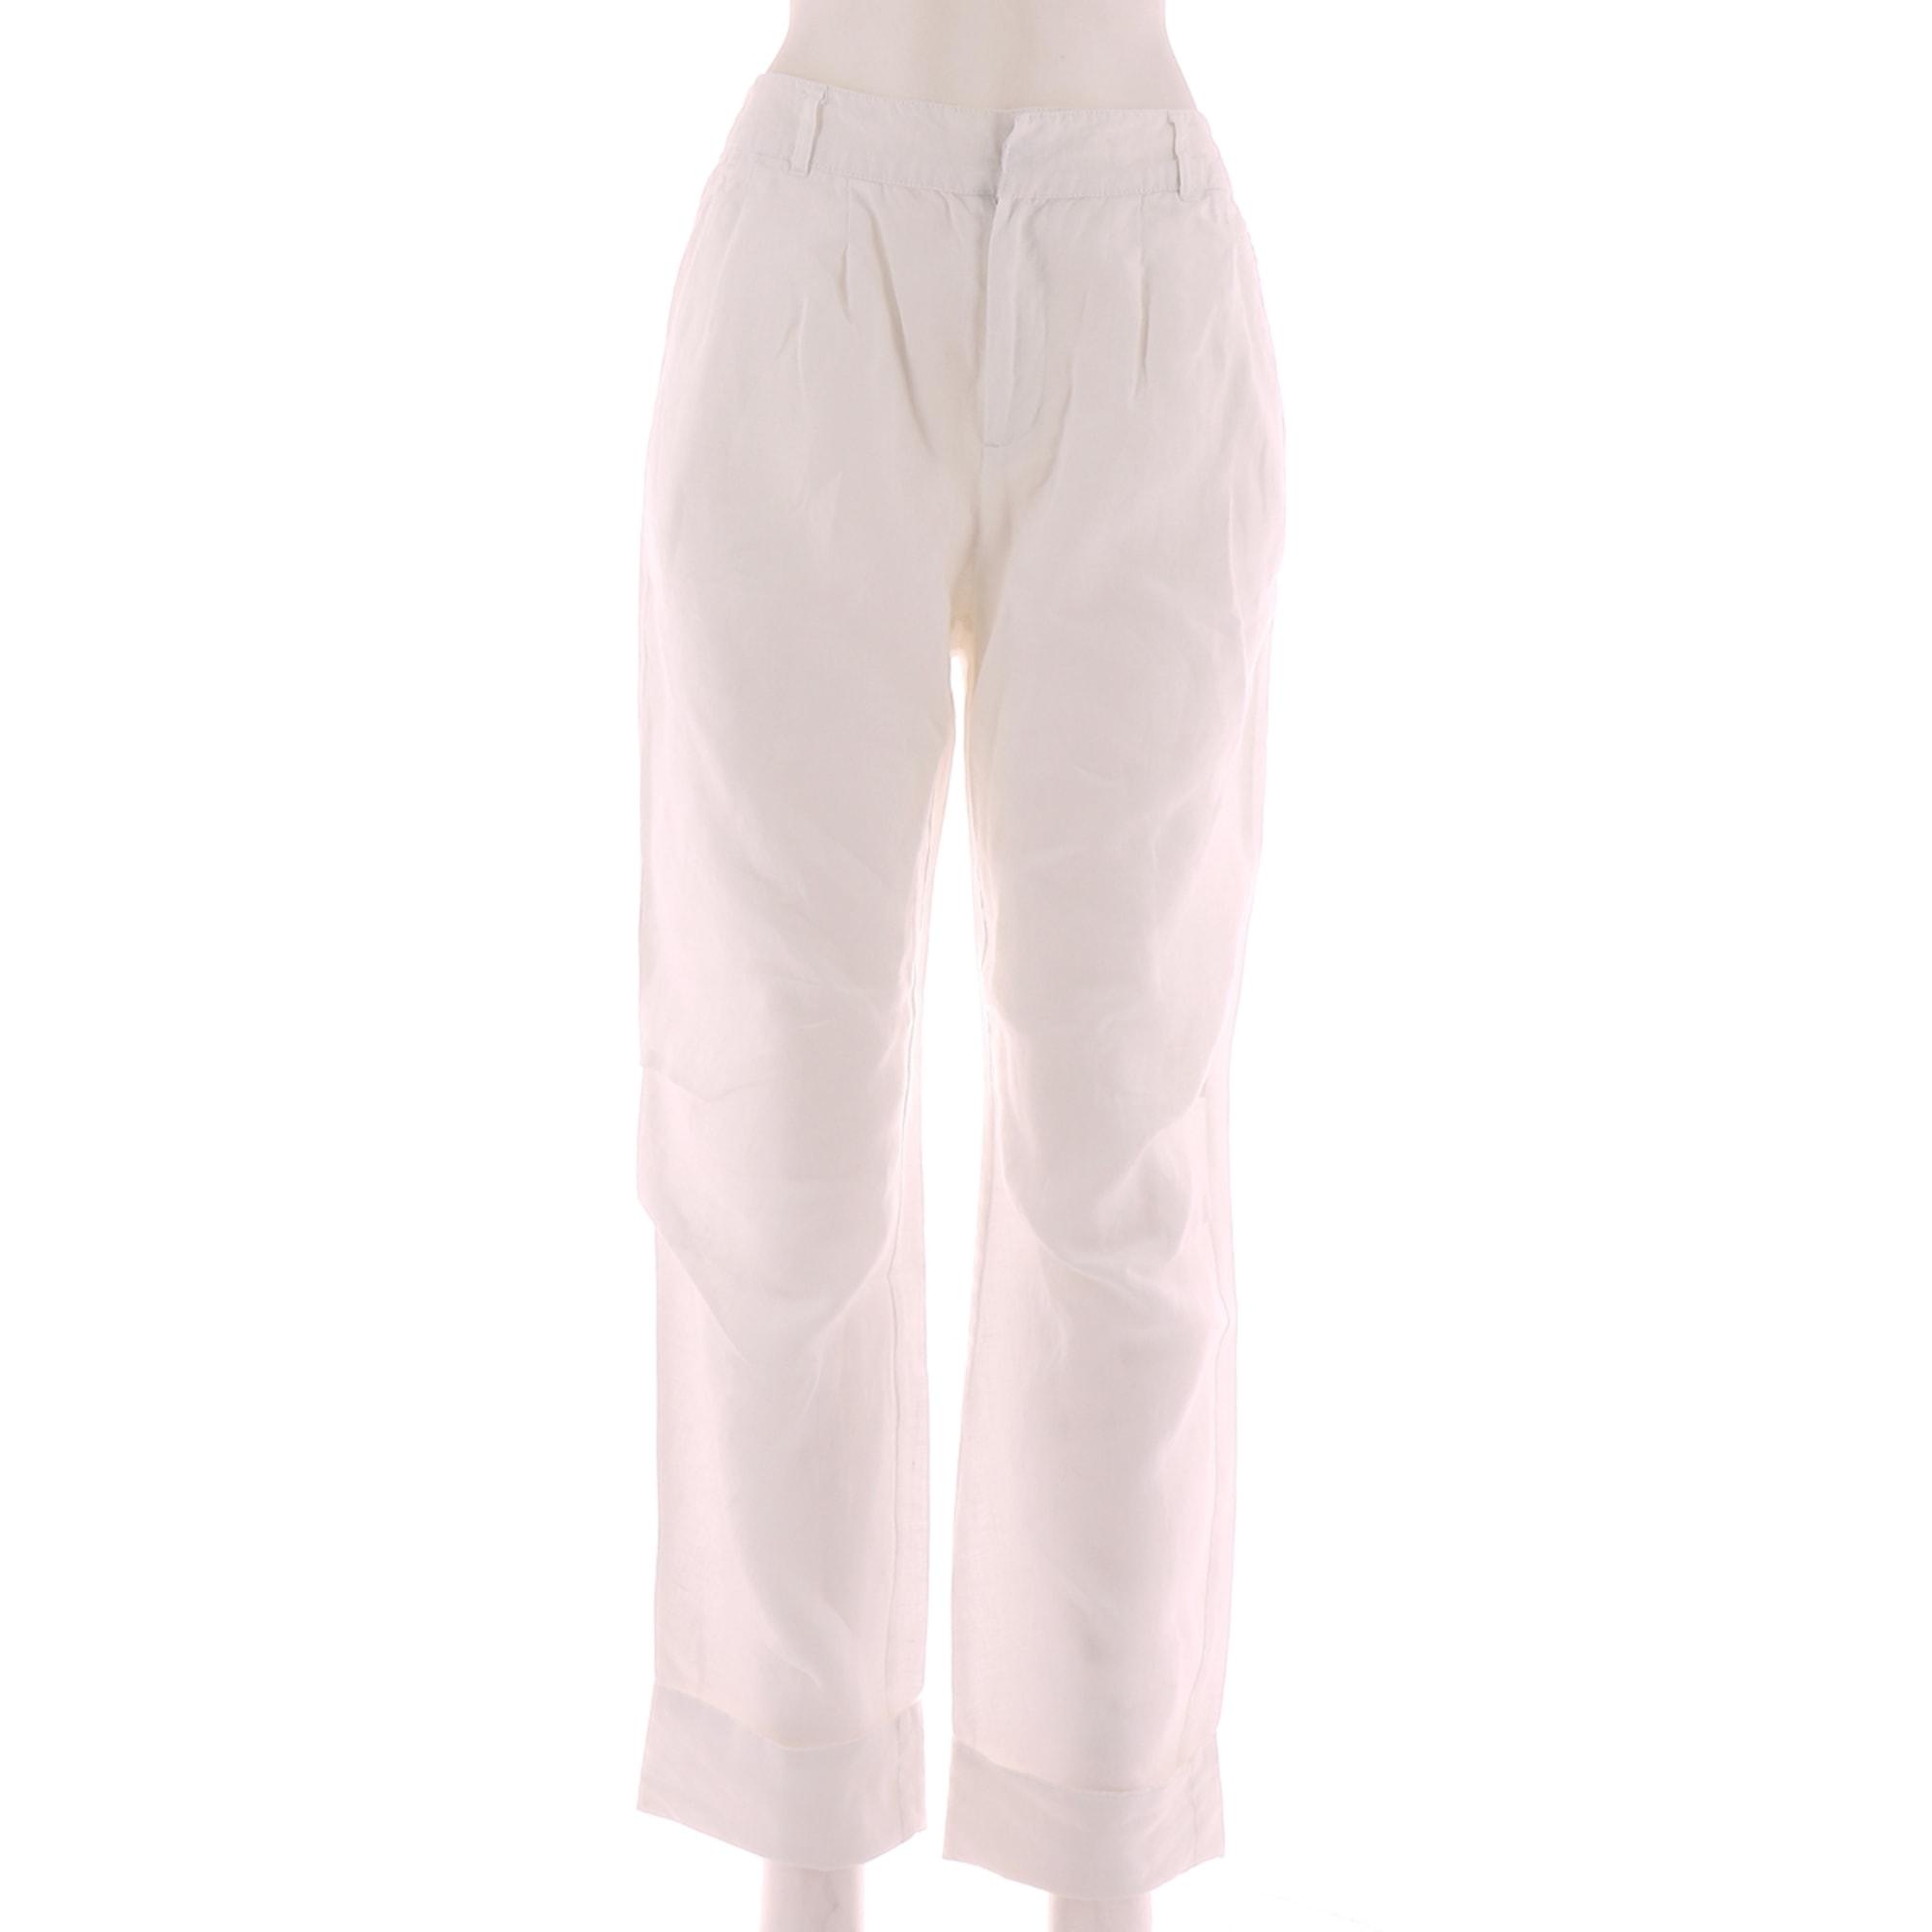 Pantalon droit BERENICE Blanc, blanc cassé, écru